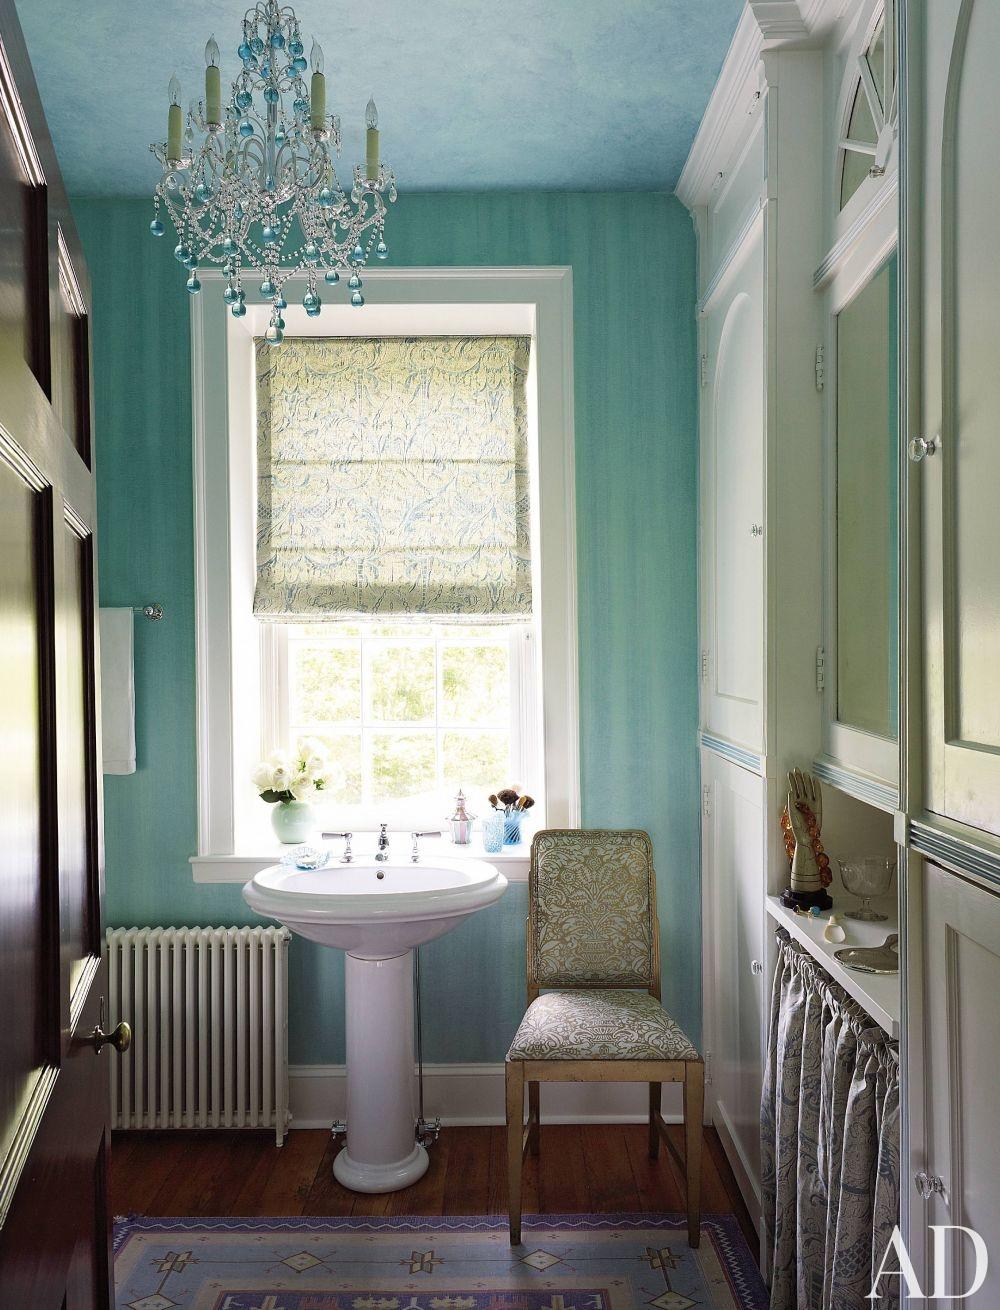 Traditional bathroom alison martin interiors ltd and jean perin interior design virginia 201110 2 1000 watermarked